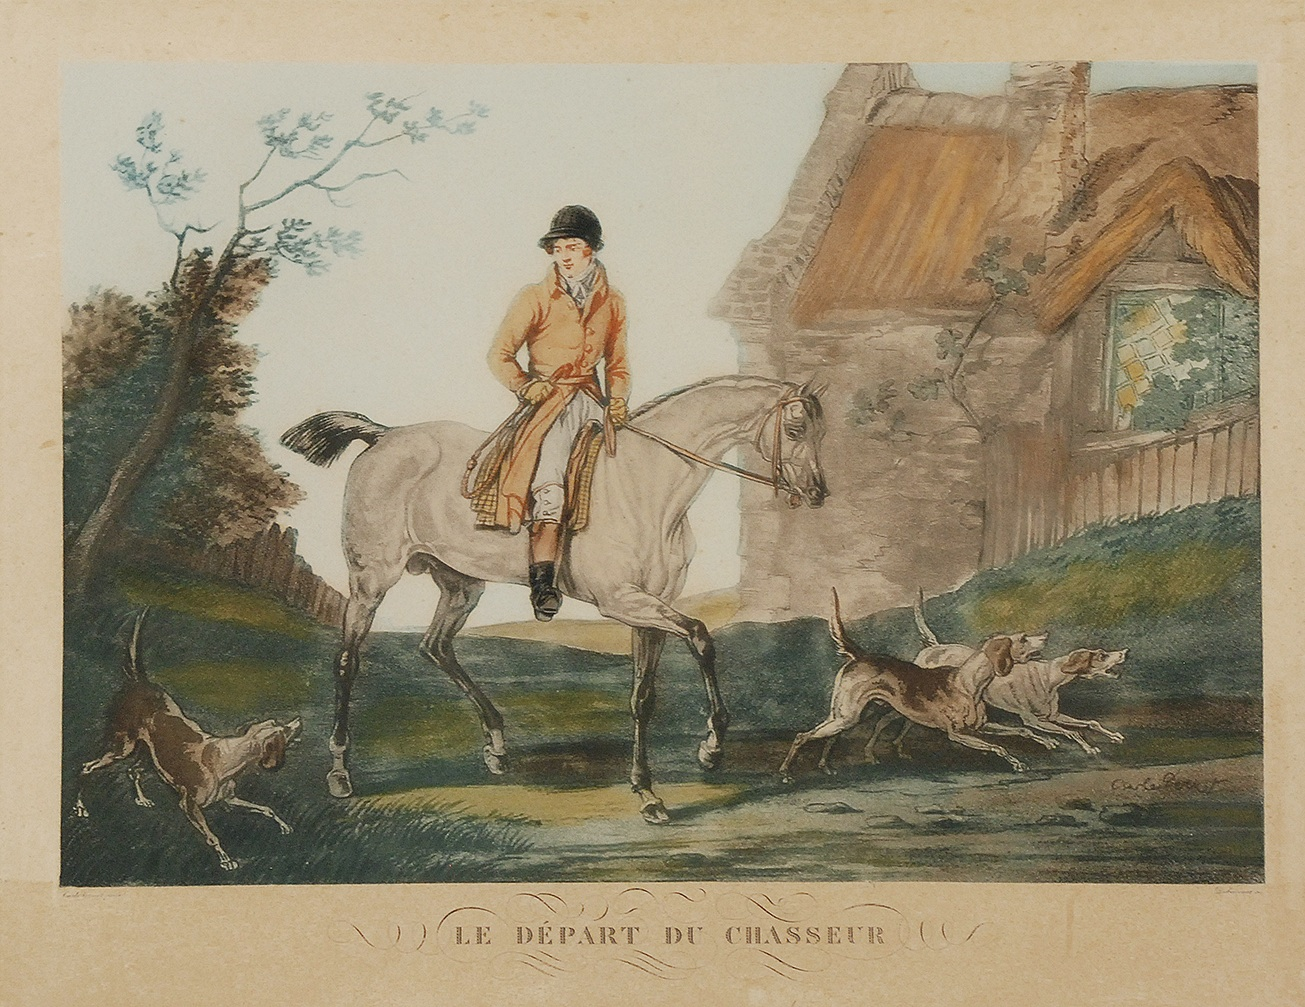 Philibert Louis DEBUCOURT (1755-1832), Carle VERNET (1758-1836)